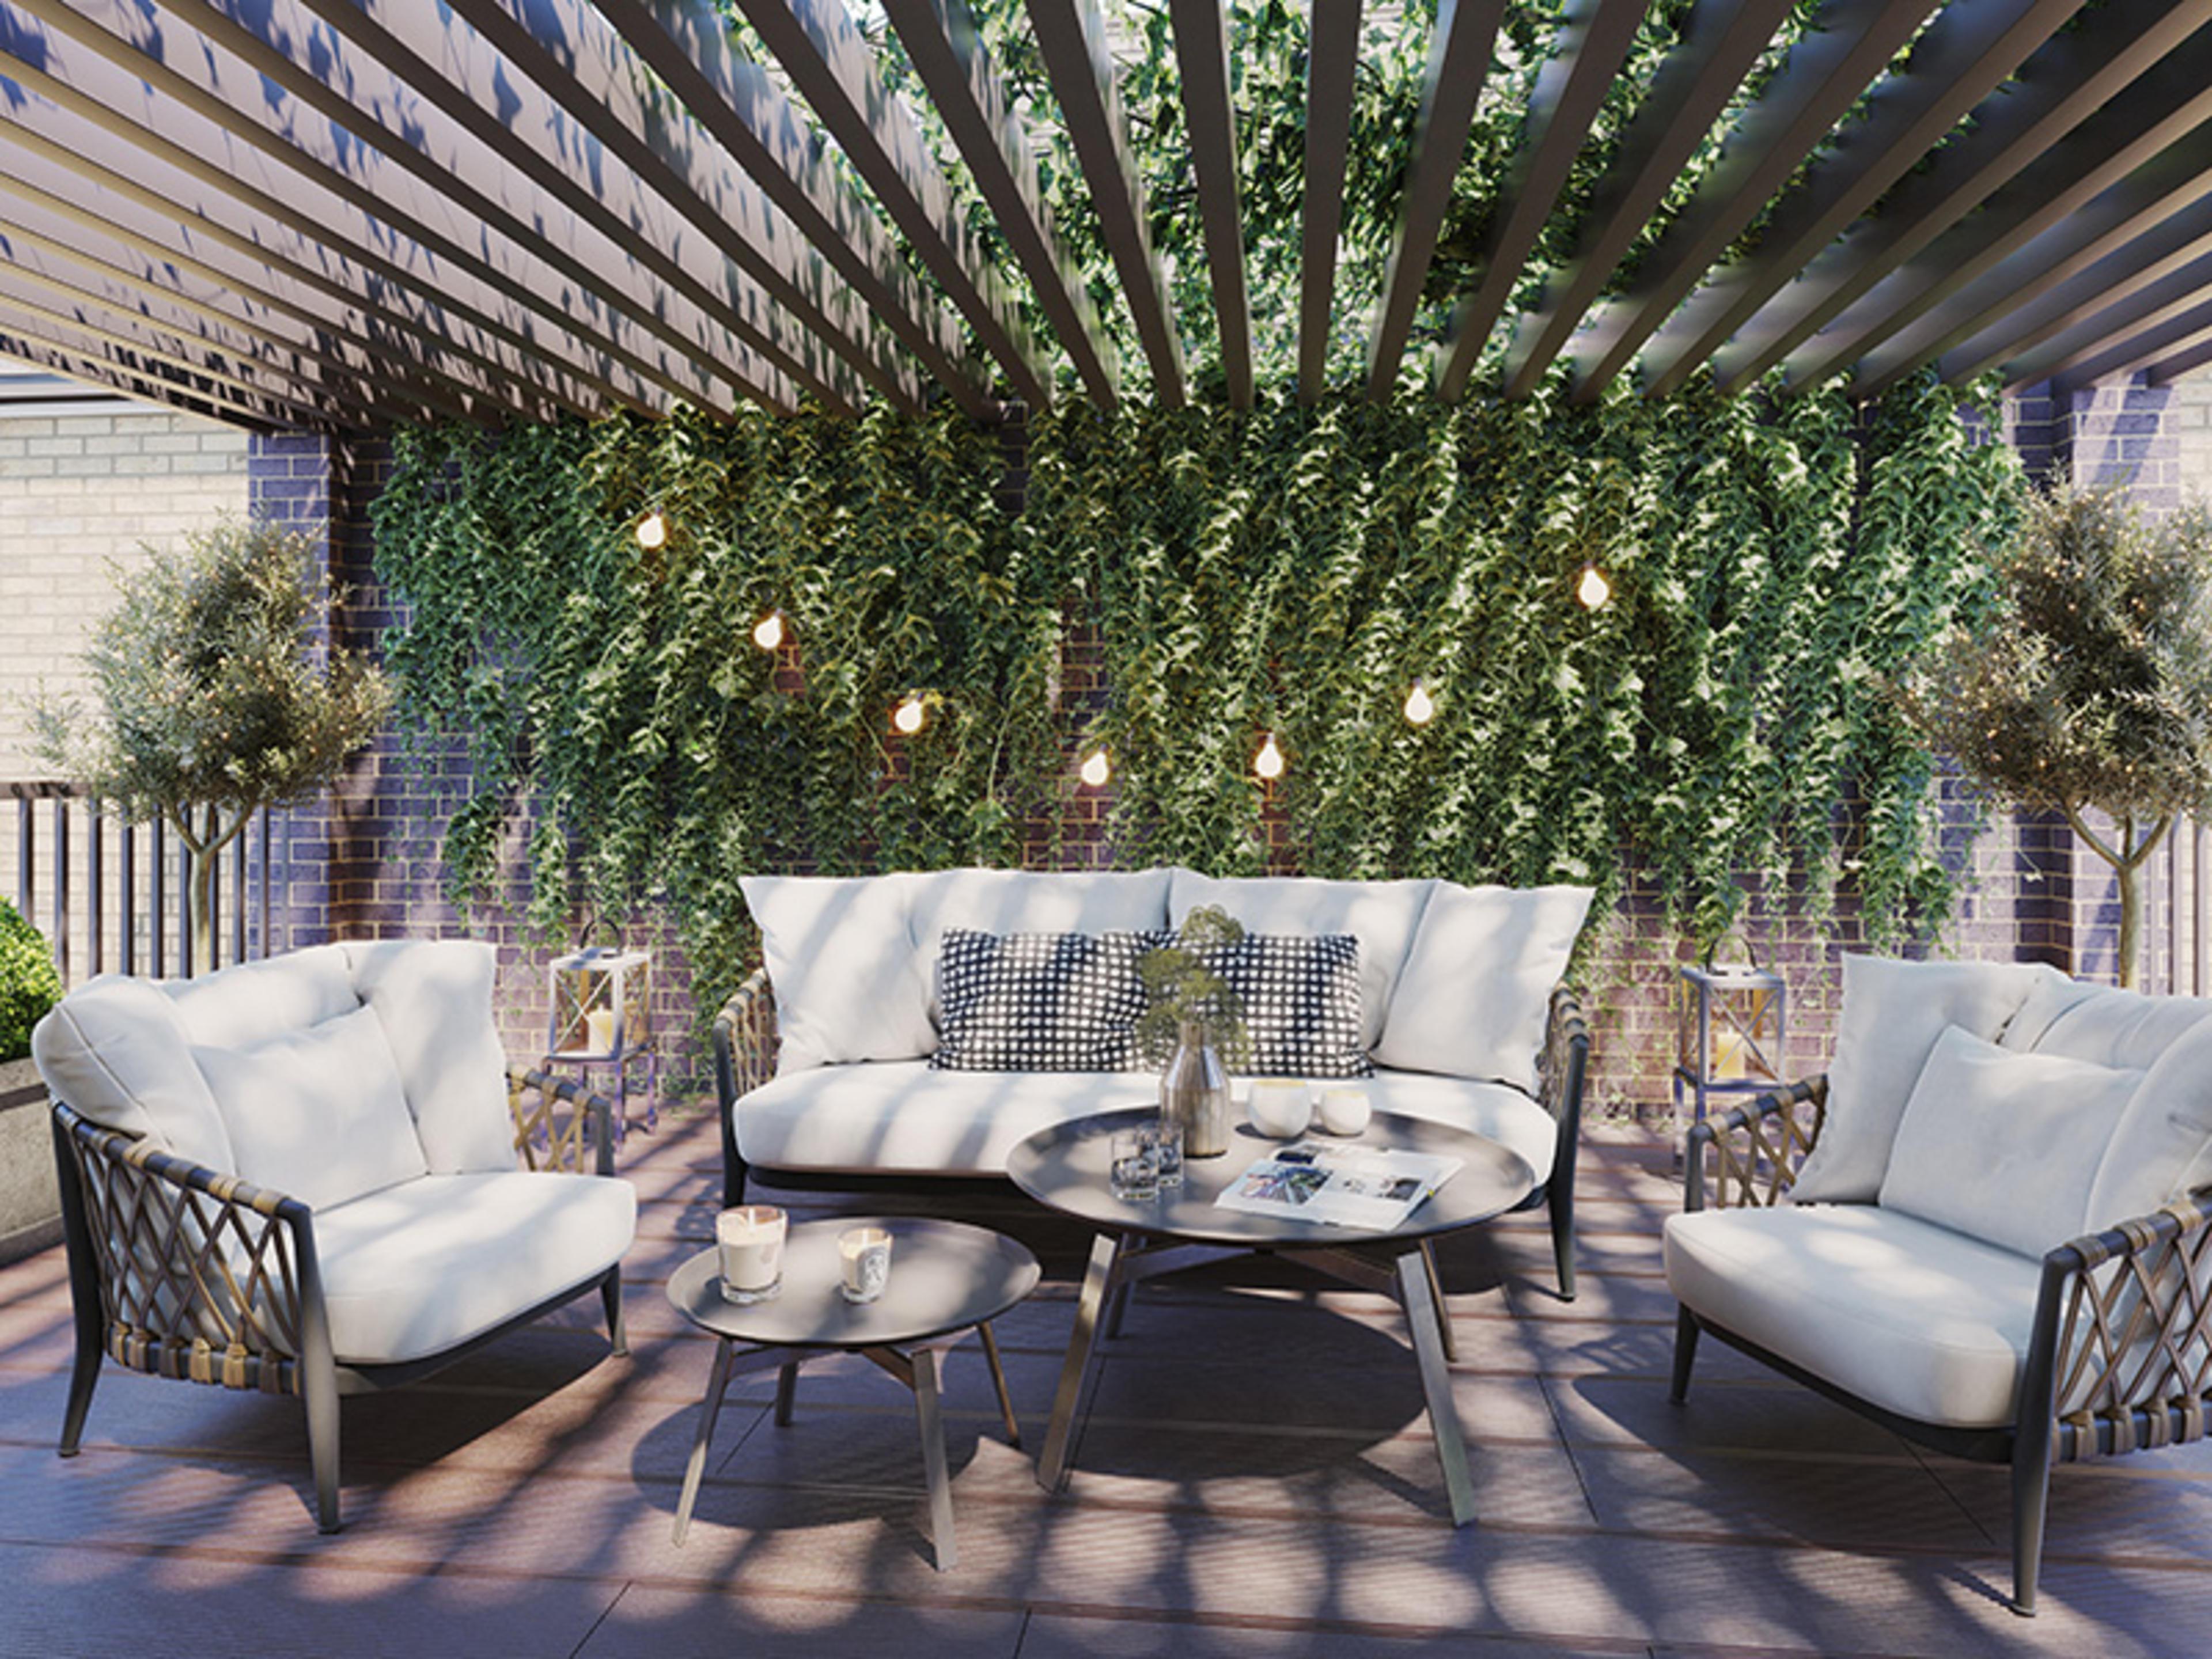 watling-grange-harrogate-furness-2-bed-home-outdoor-terrace-1